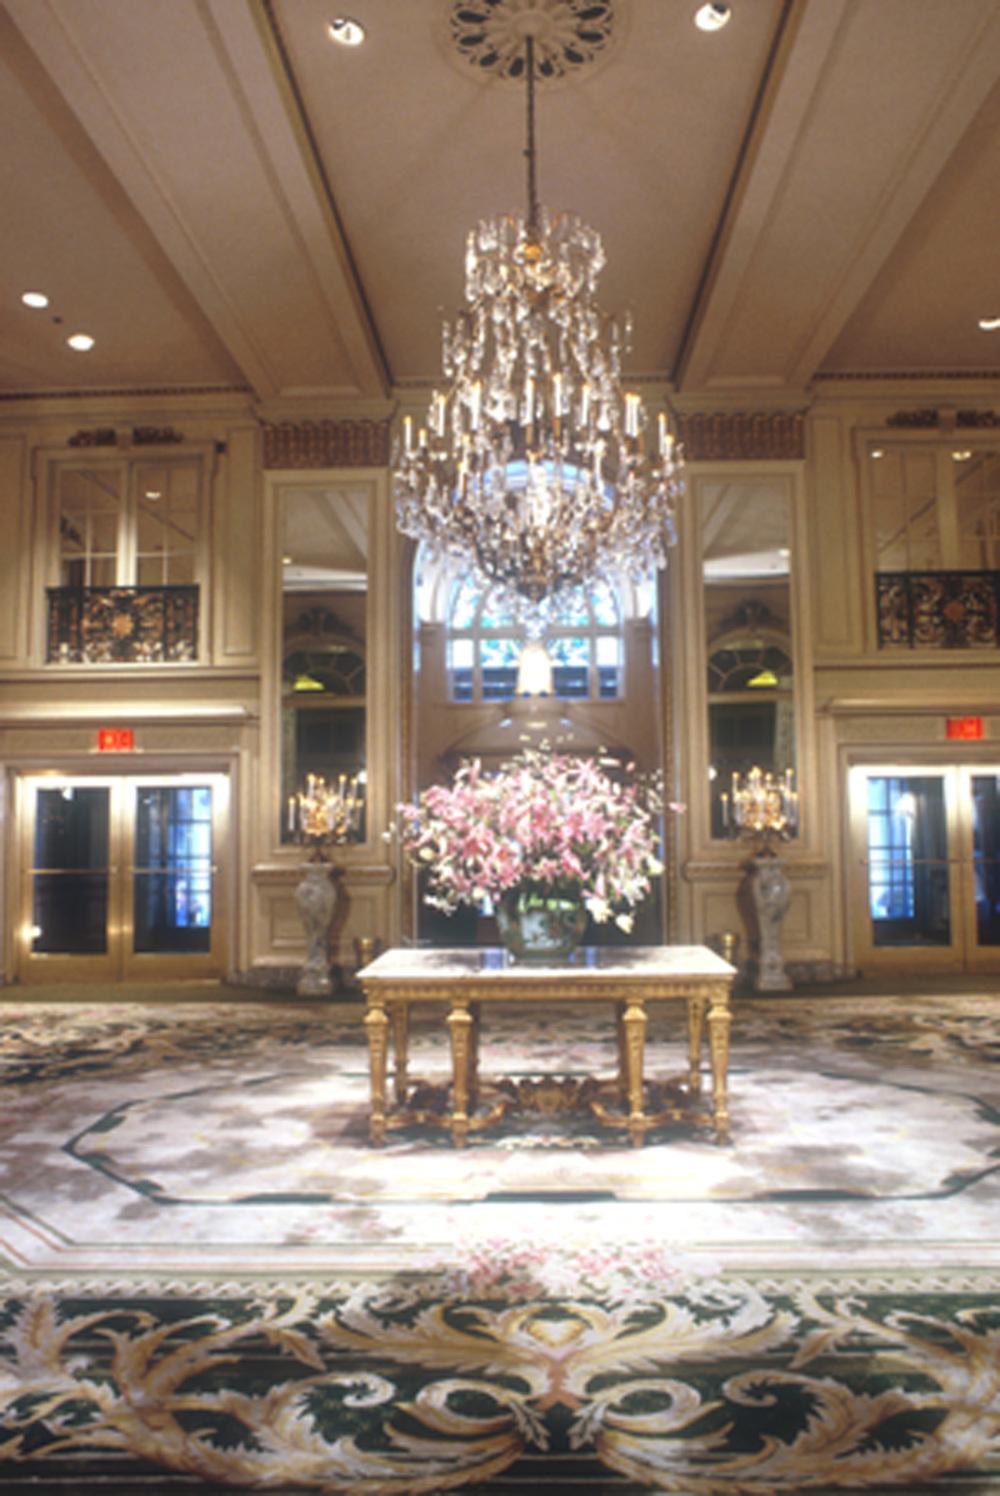 9706 - Plaza - Interior Hall with Flowers.jpg